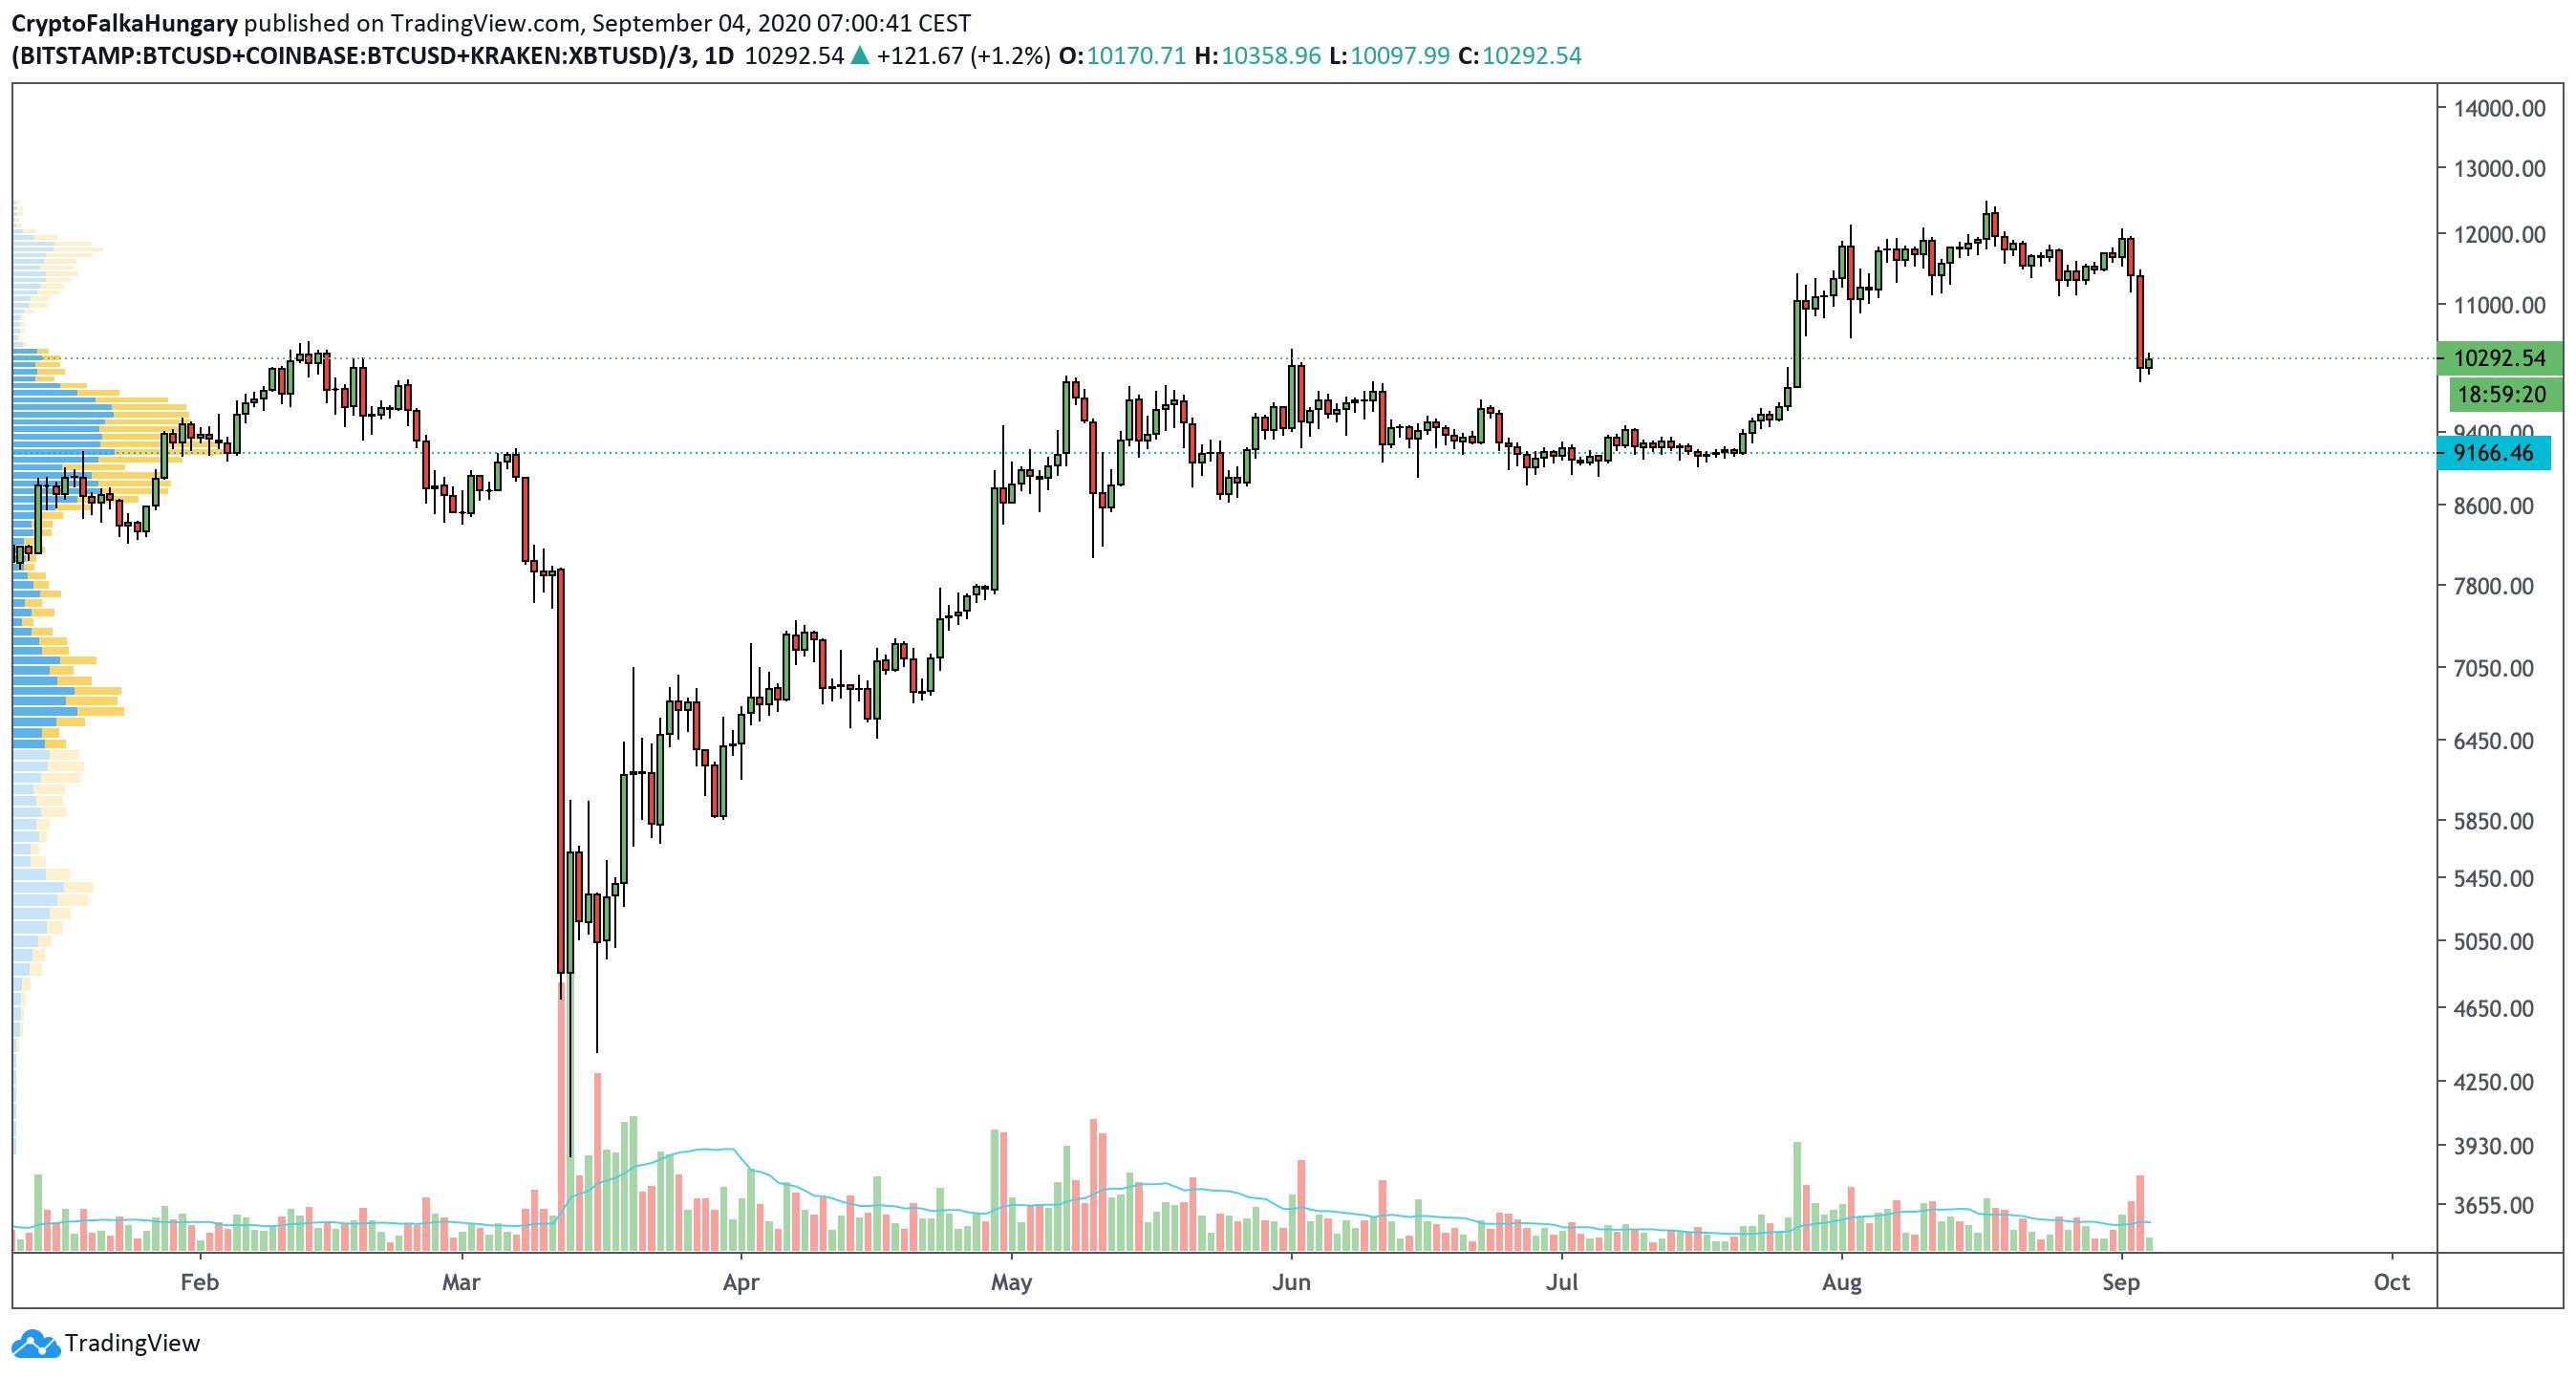 Bitcoin árfolyama 2020 I Cryptofalka